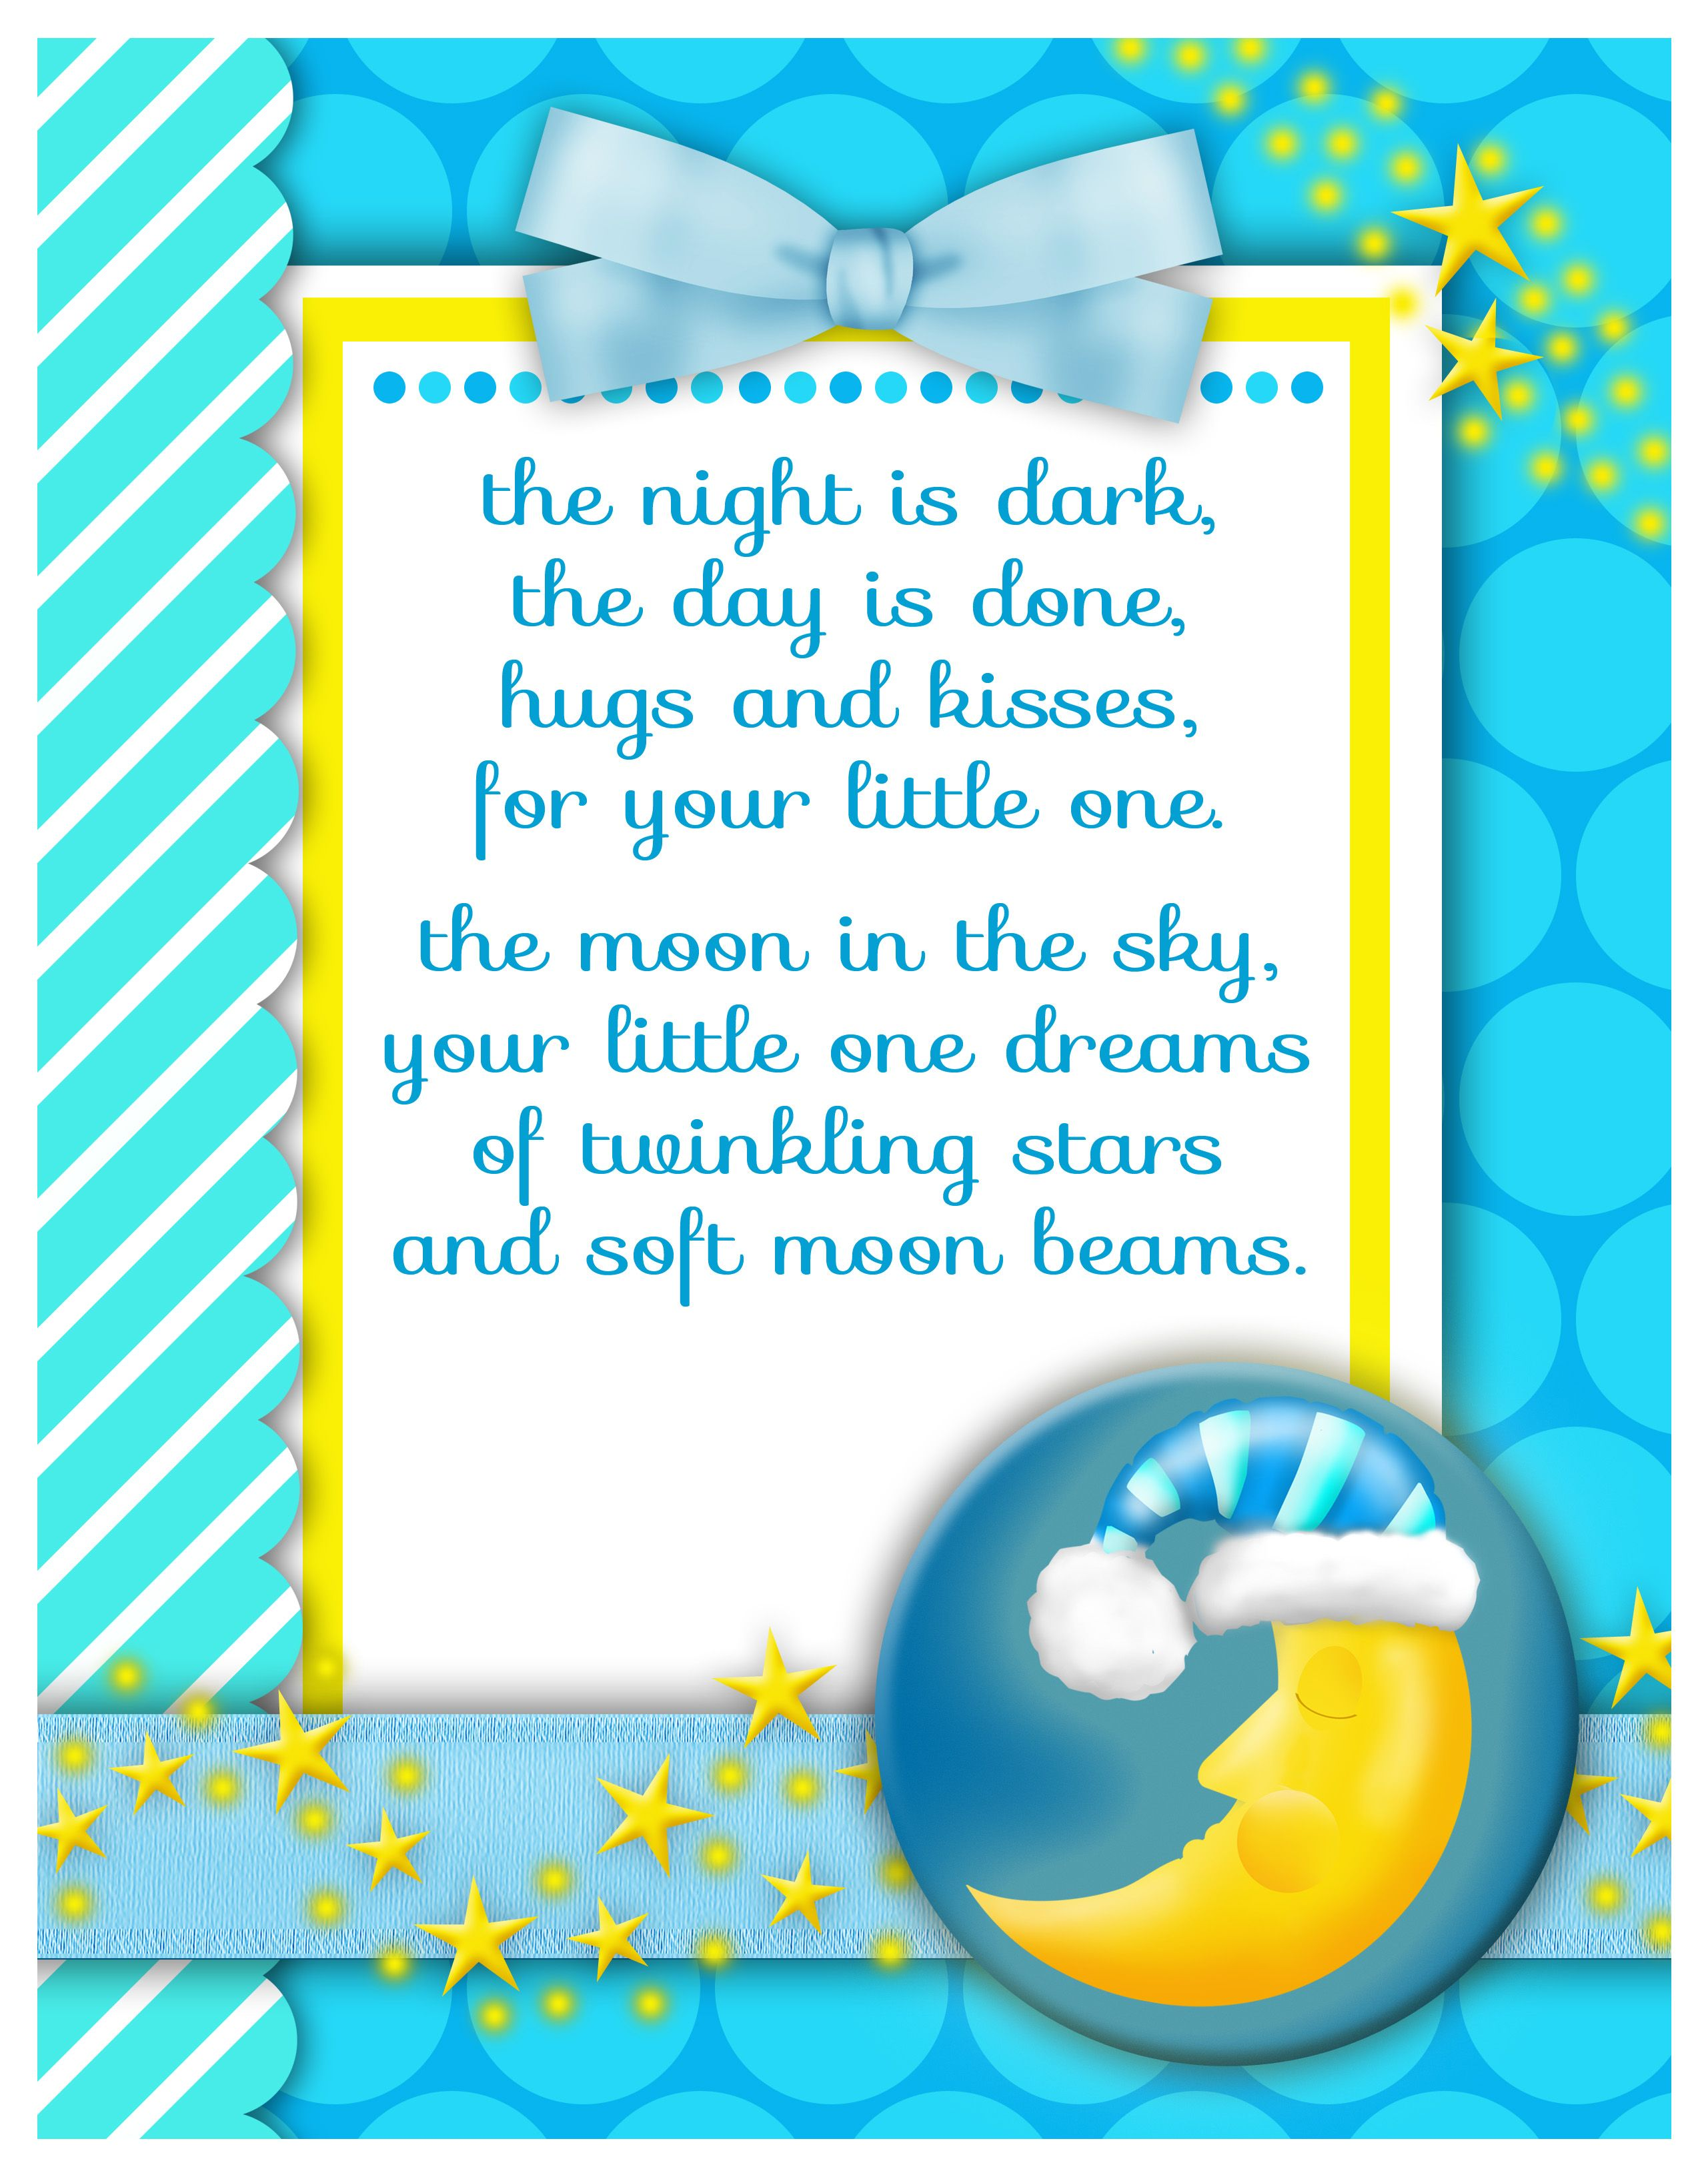 Goodnight baby boy baby shower gift gift ideas pinterest goodnight baby boy baby shower gift negle Gallery